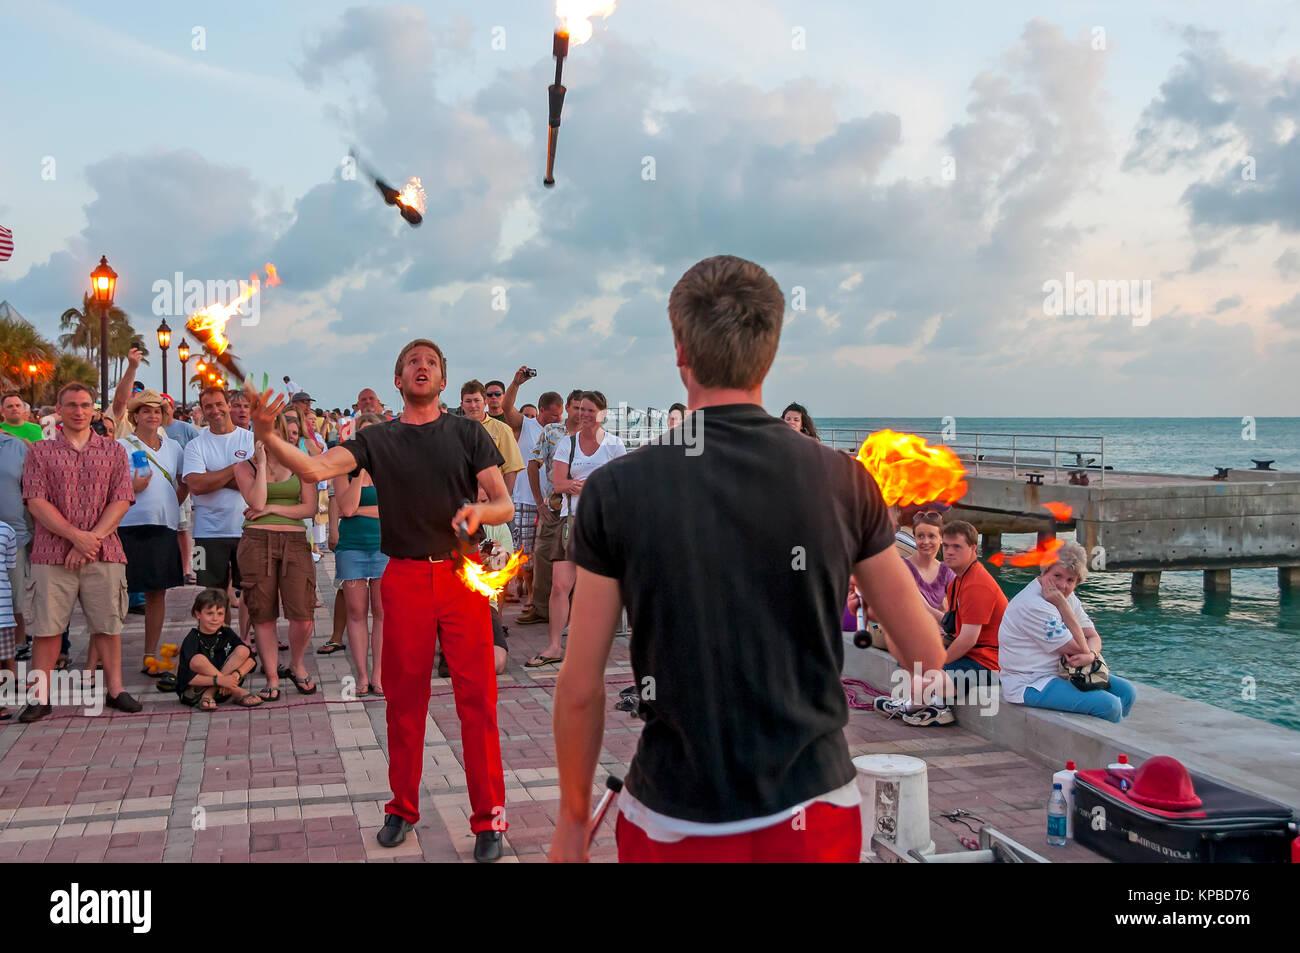 Jufflers with fire batons perform at Mallory Square Sunset Celebration, Key West, Florida - Stock Image